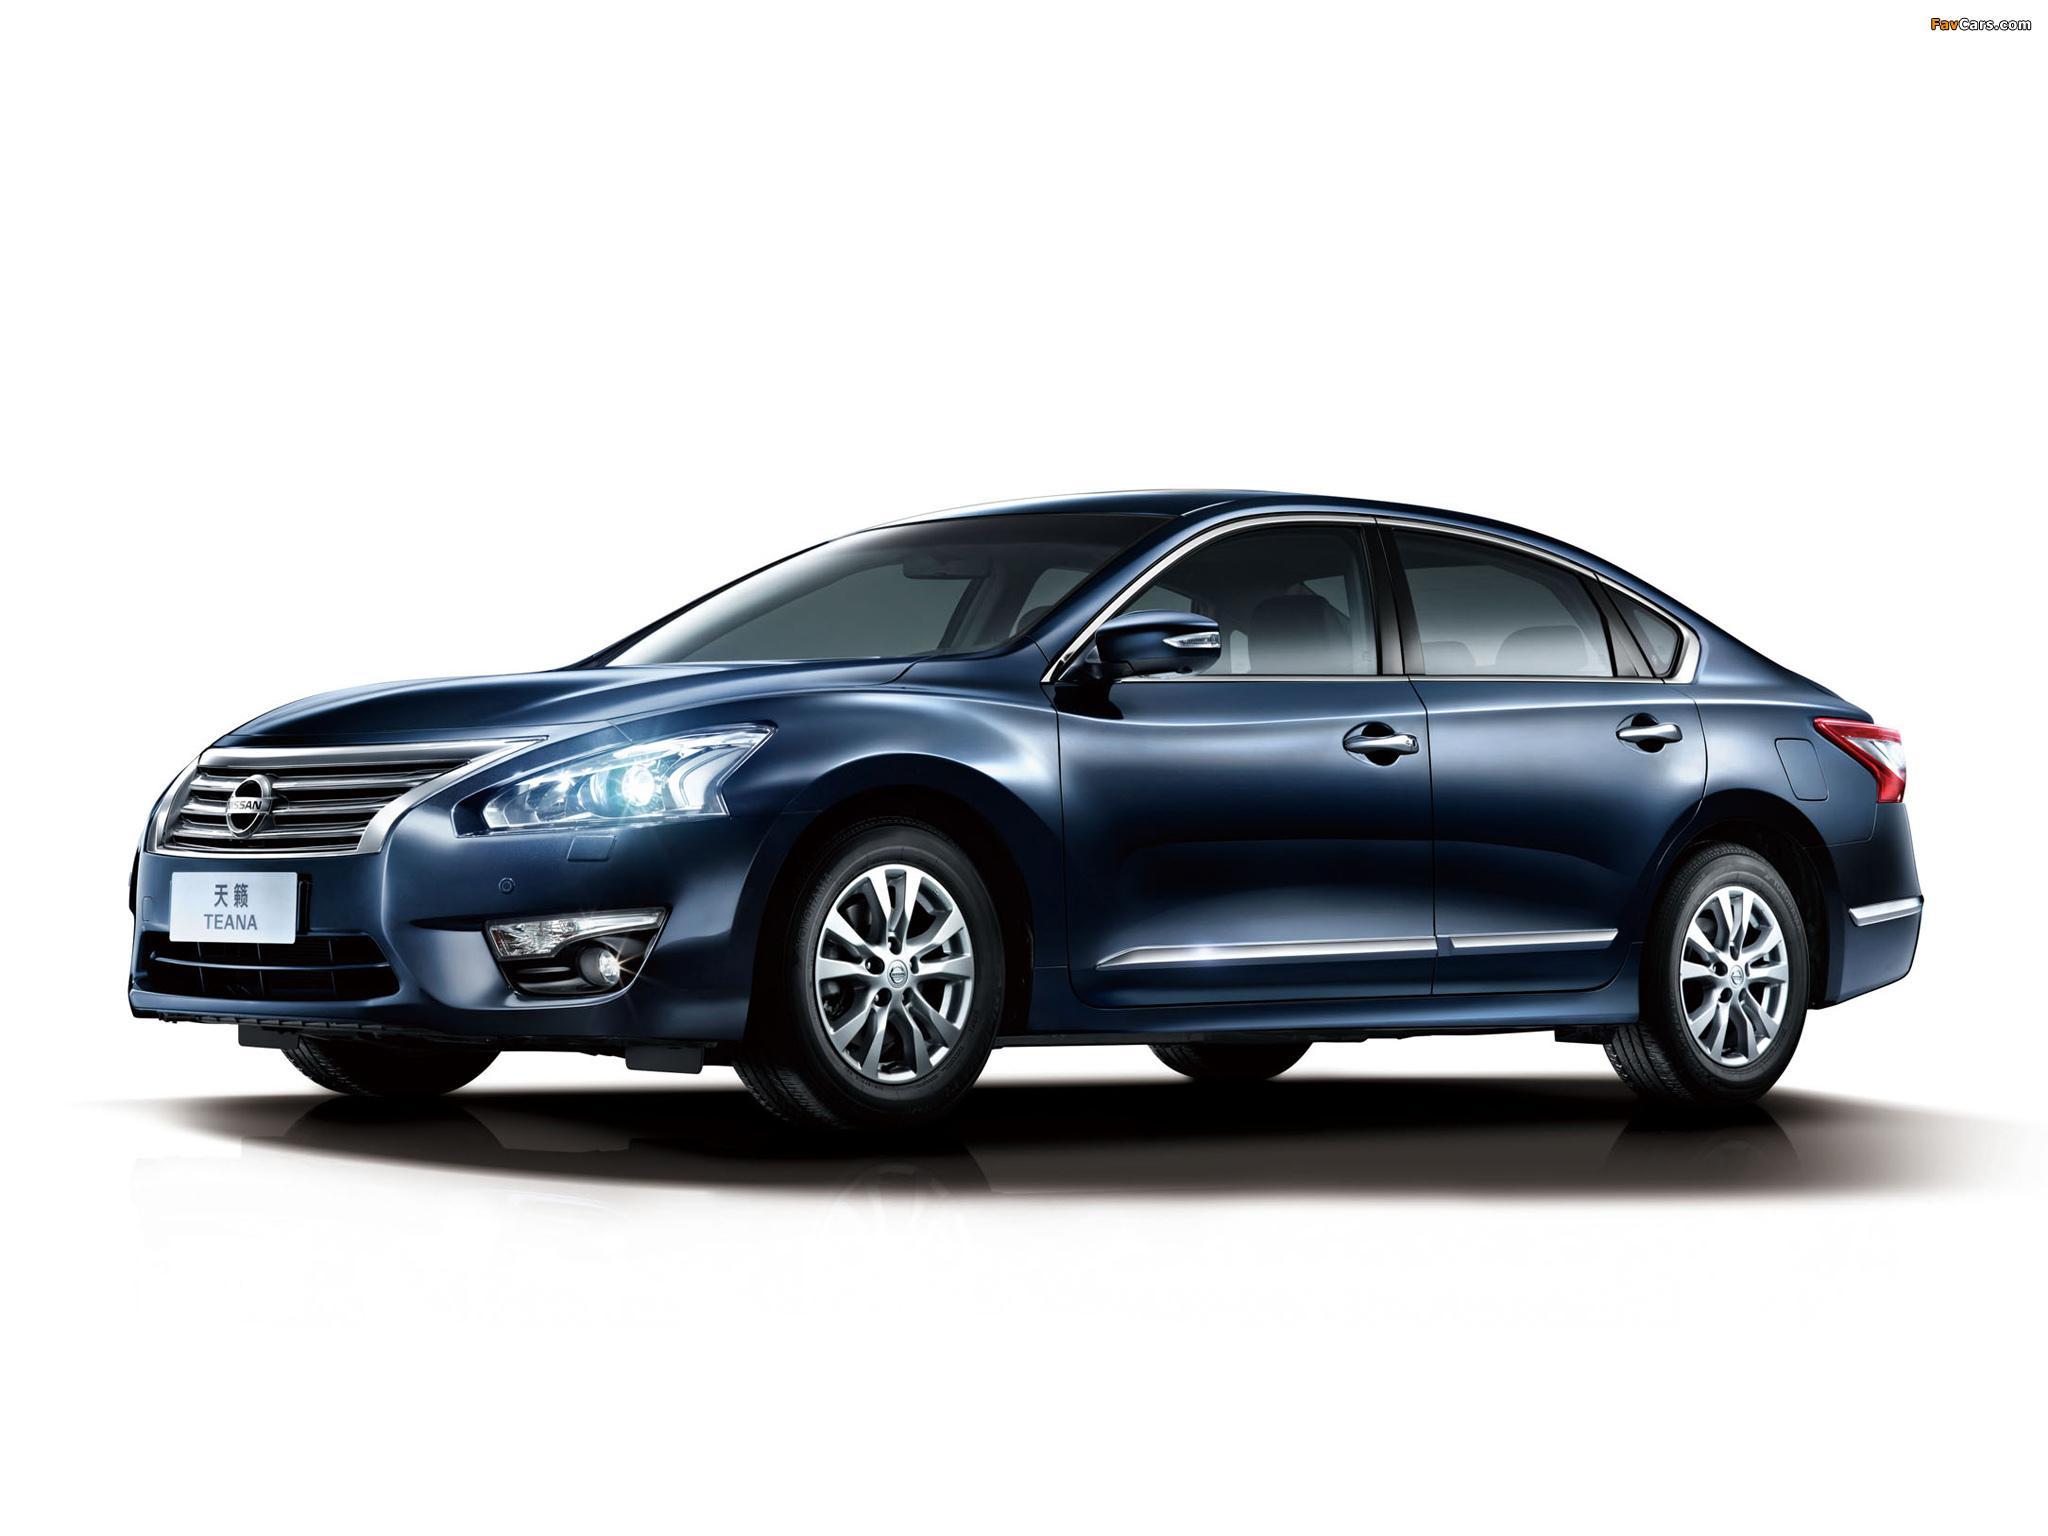 All Car Wallpapers Hd Photos Of Nissan Teana Cn Spec L33 2013 2048x1536